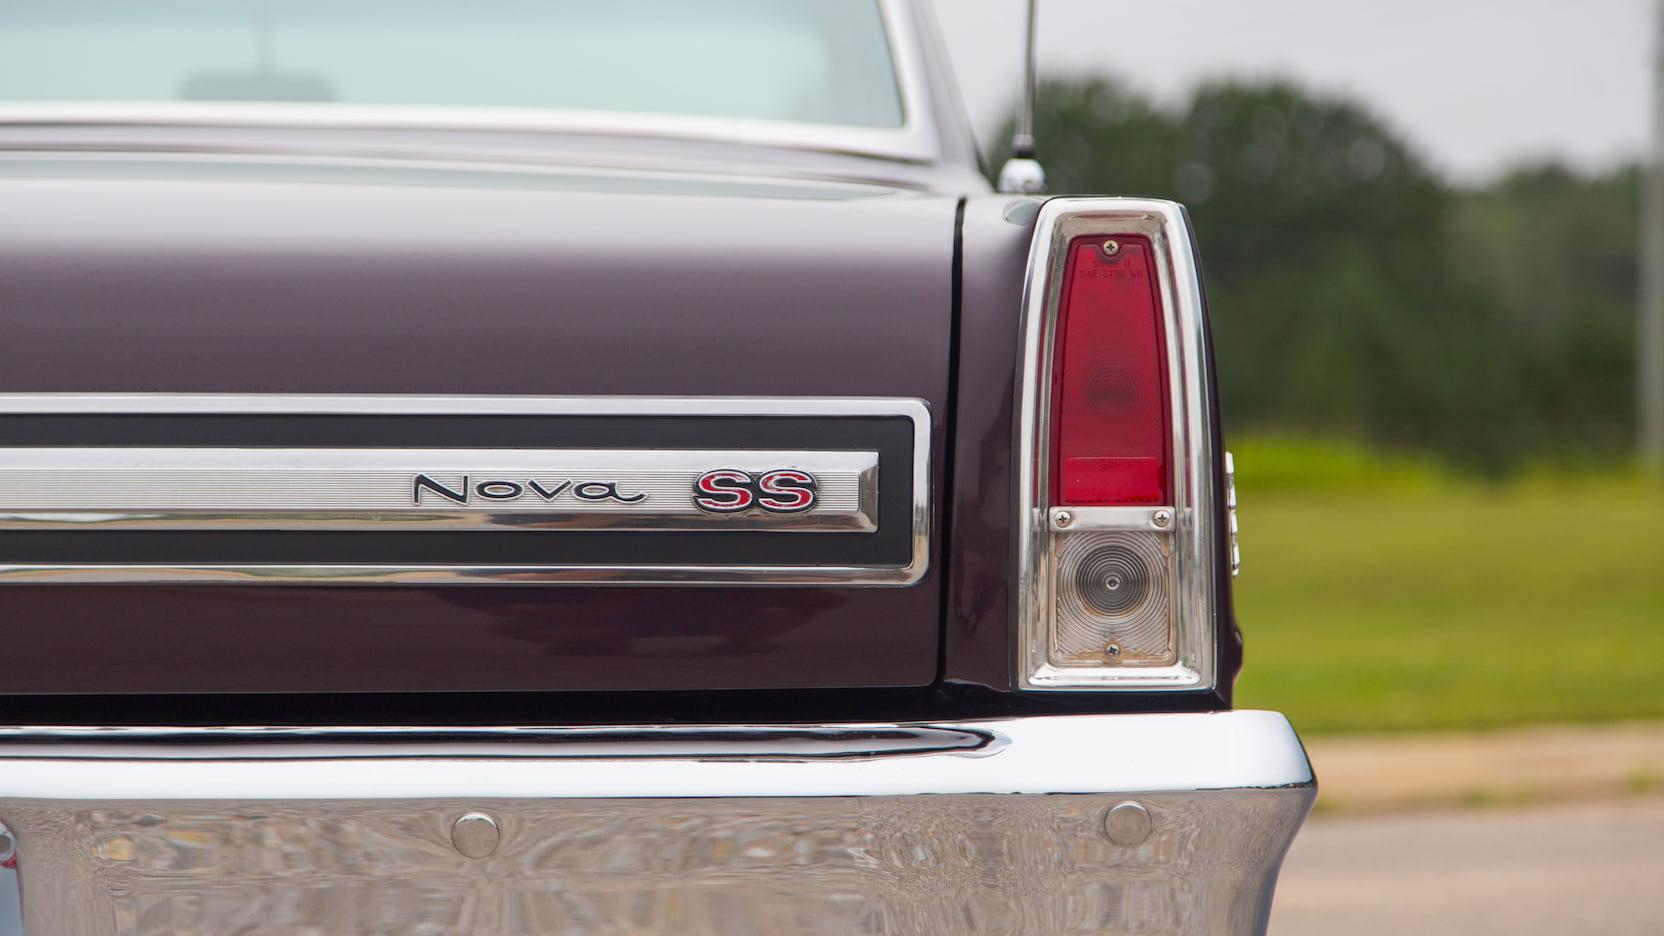 1967 Chevrolet Nova SS trunk badge